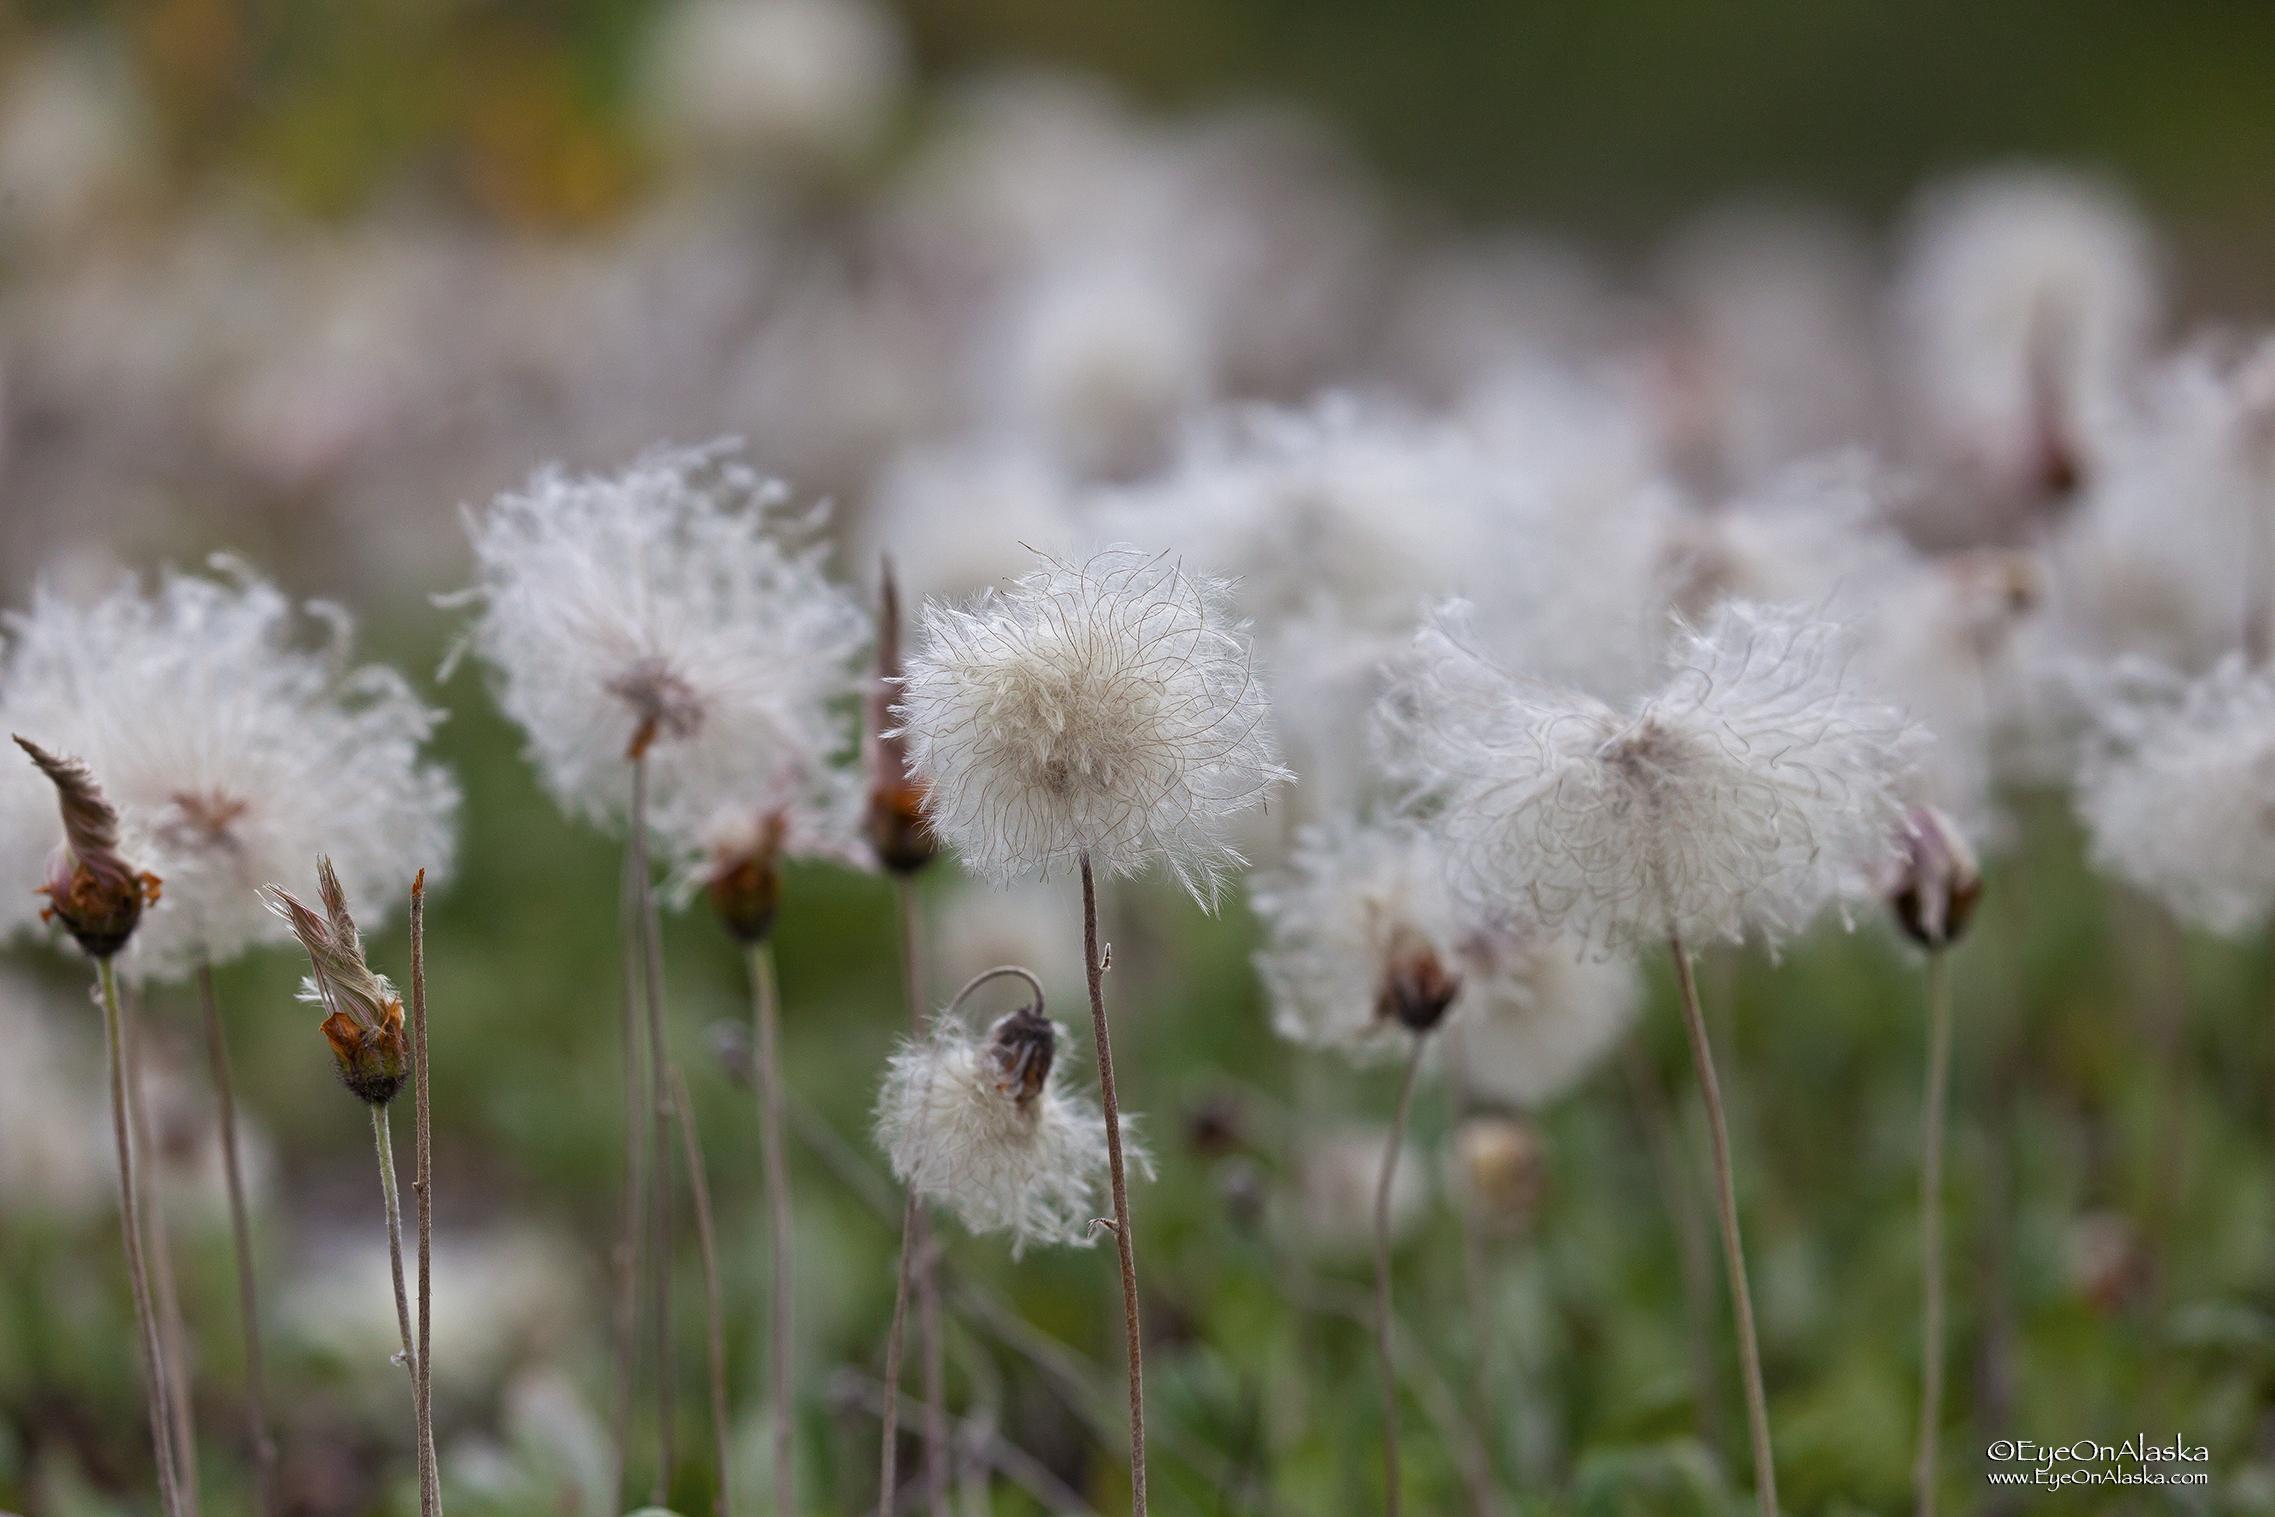 Tundra cotton.